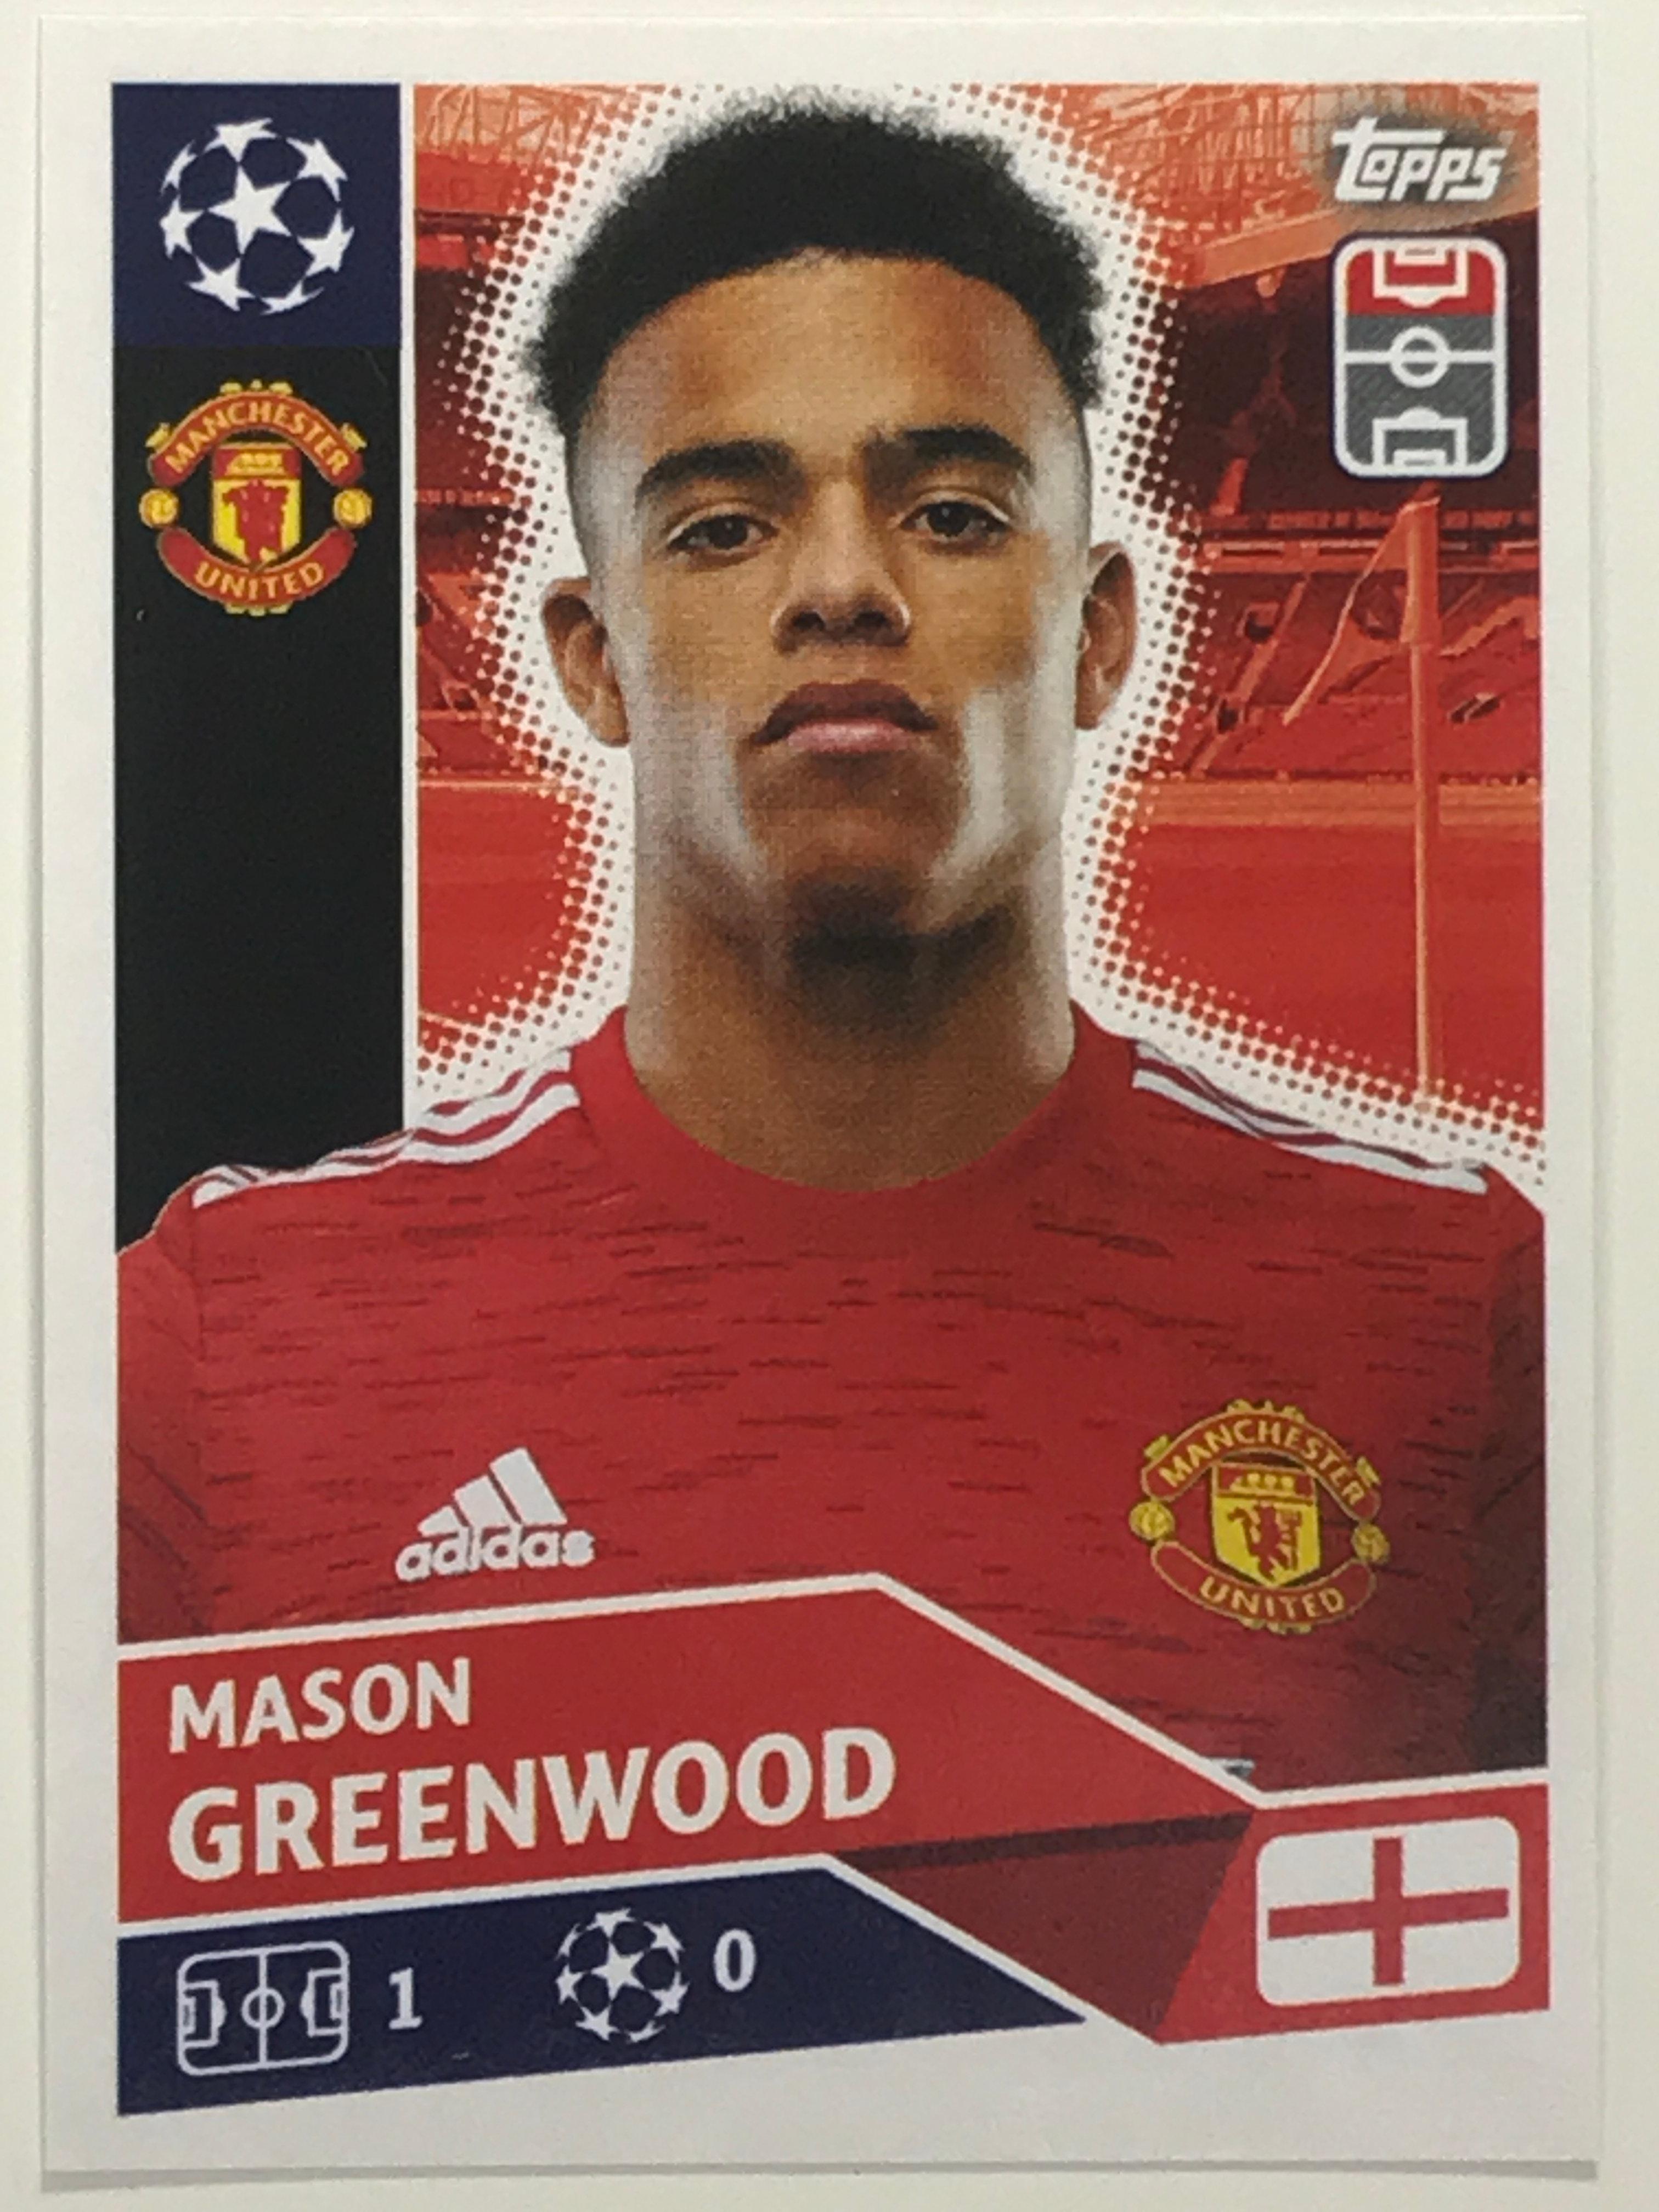 Topps UEFA Champions League 2020//21 Mason Greenwood Autocollant pas de Mun 18